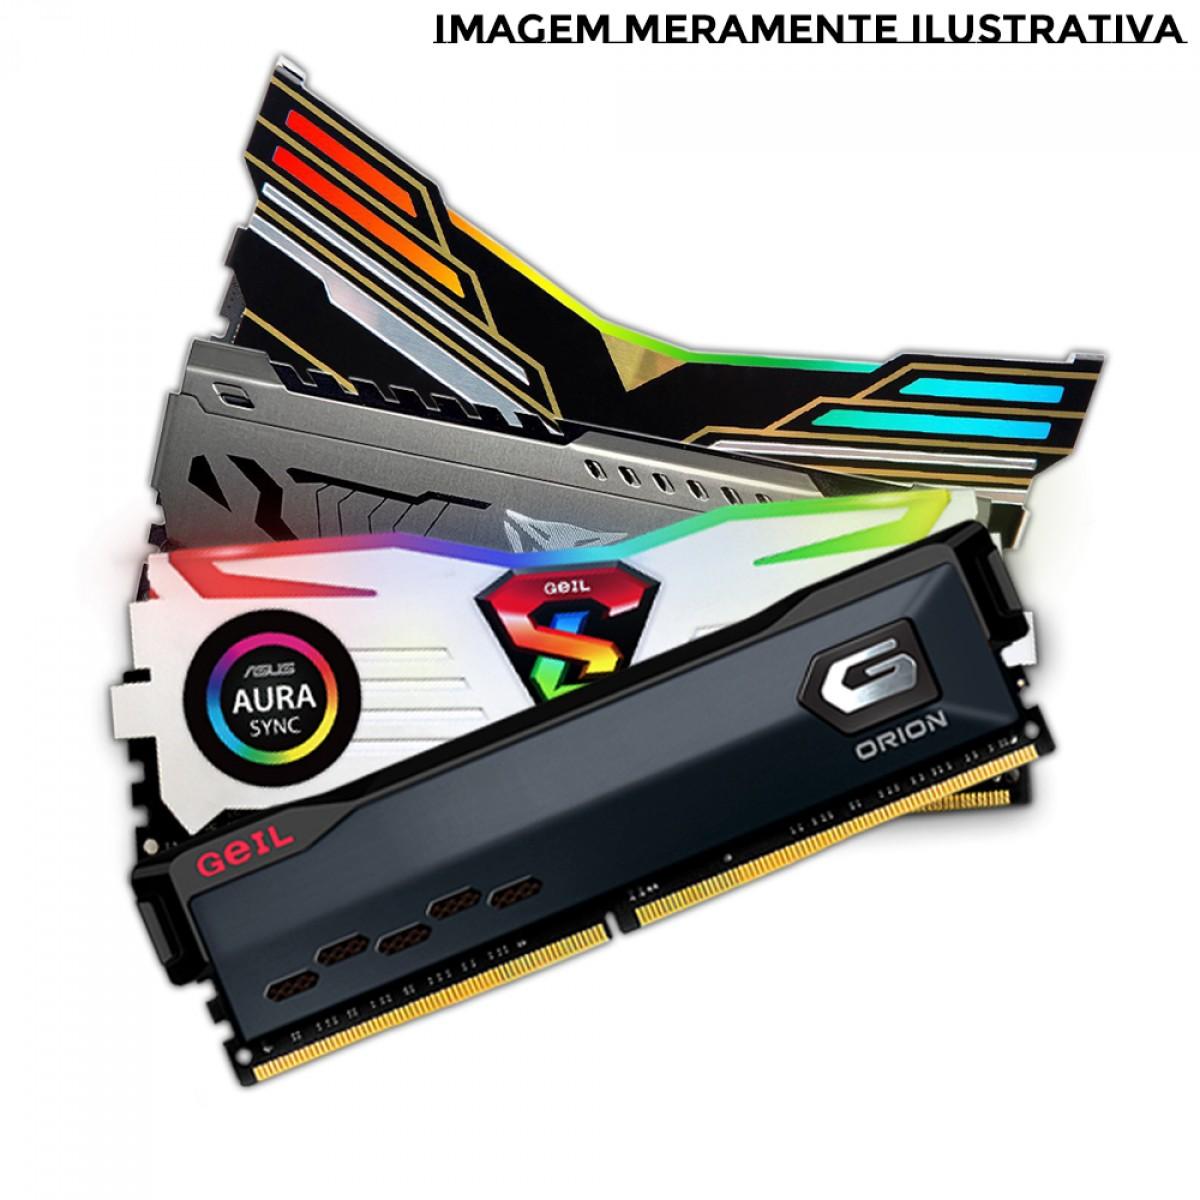 Kit Upgrade, ASUS TUF Gaming X570-Plus + AMD Ryzen 7 5700G + Memória DDR4, 8GB 3000MHz